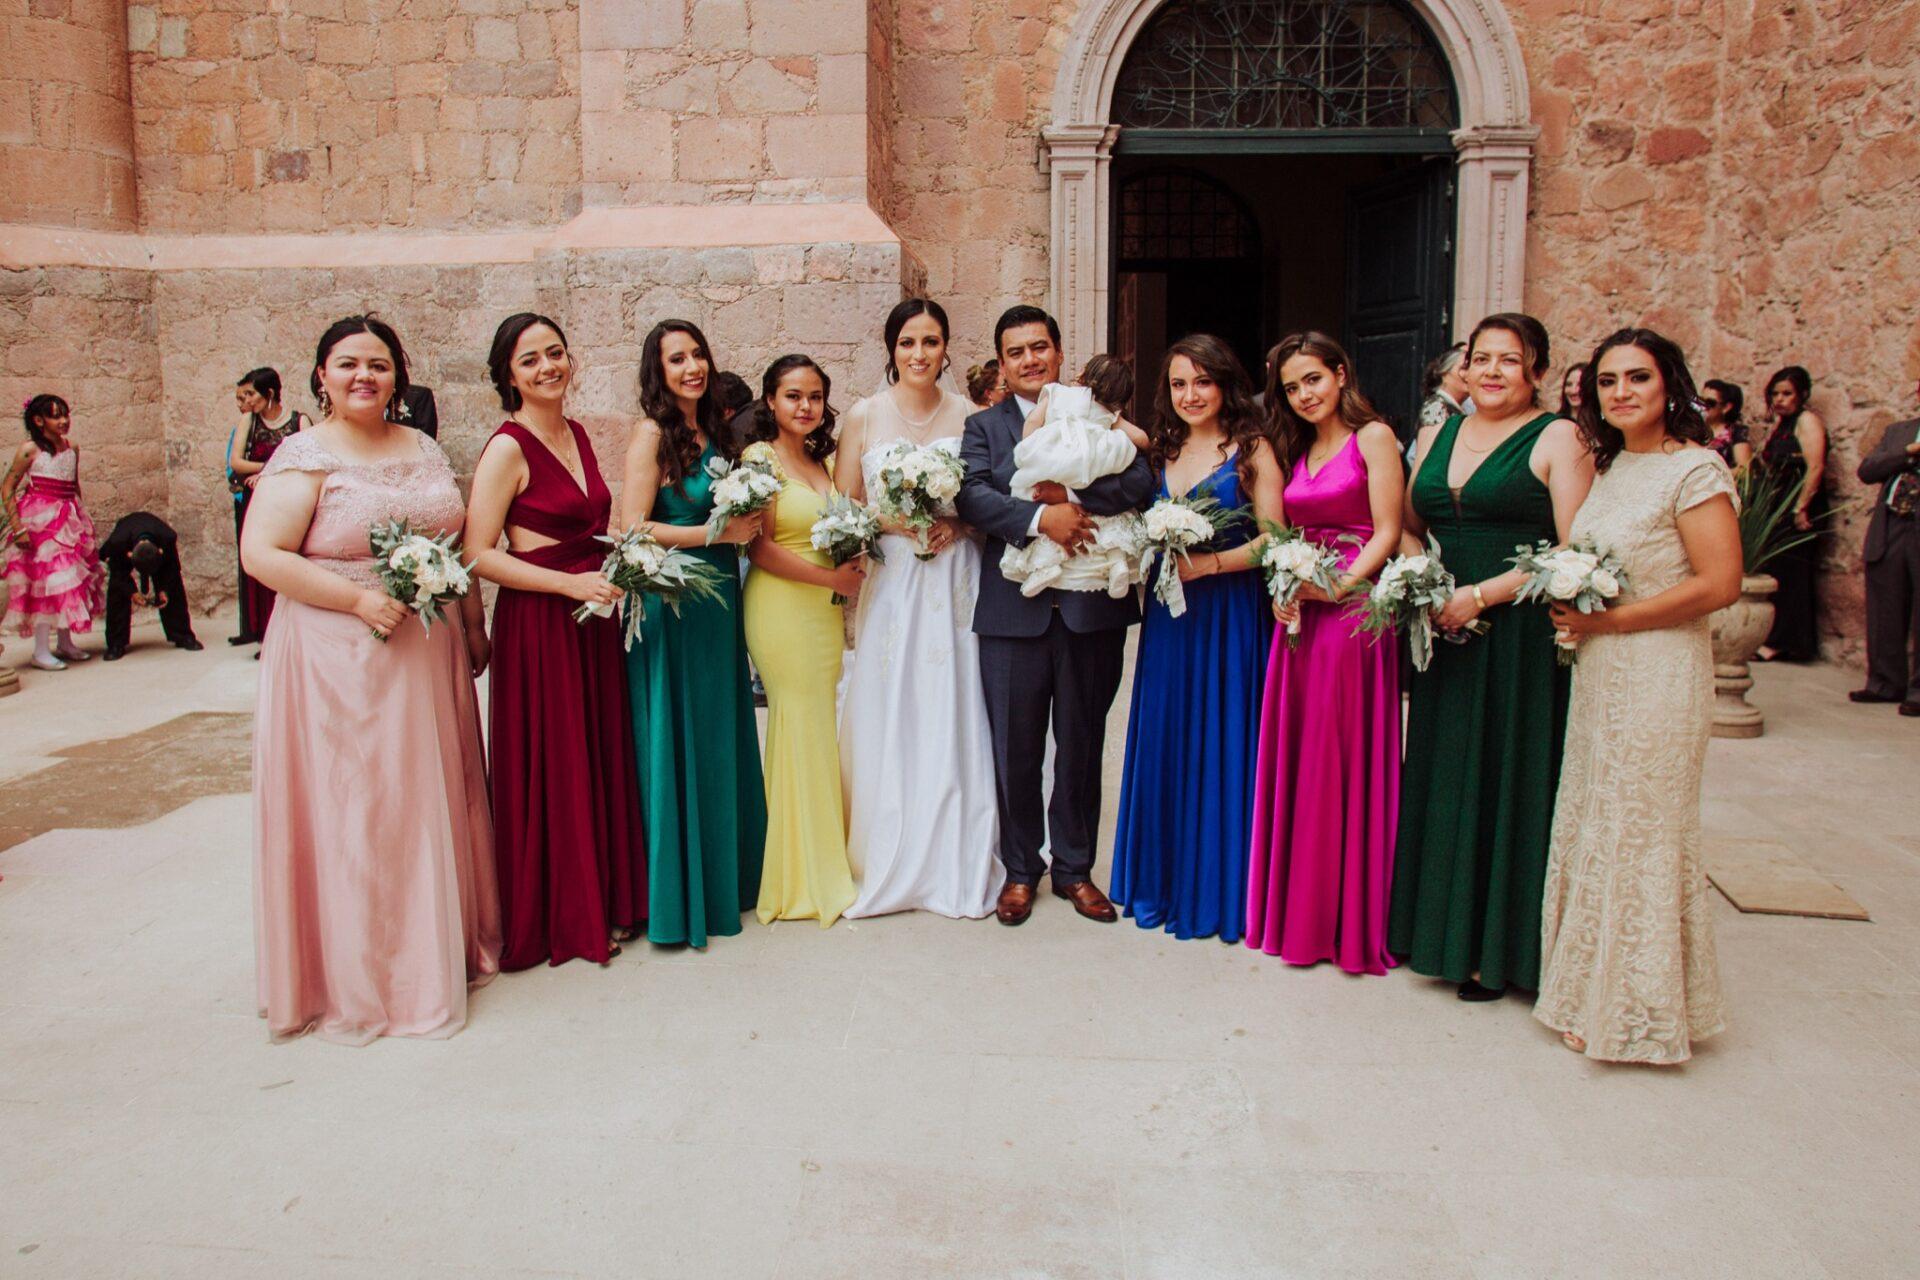 javier_noriega_fotografo_bodas_centro_platero_zacatecas_wedding_photographer18